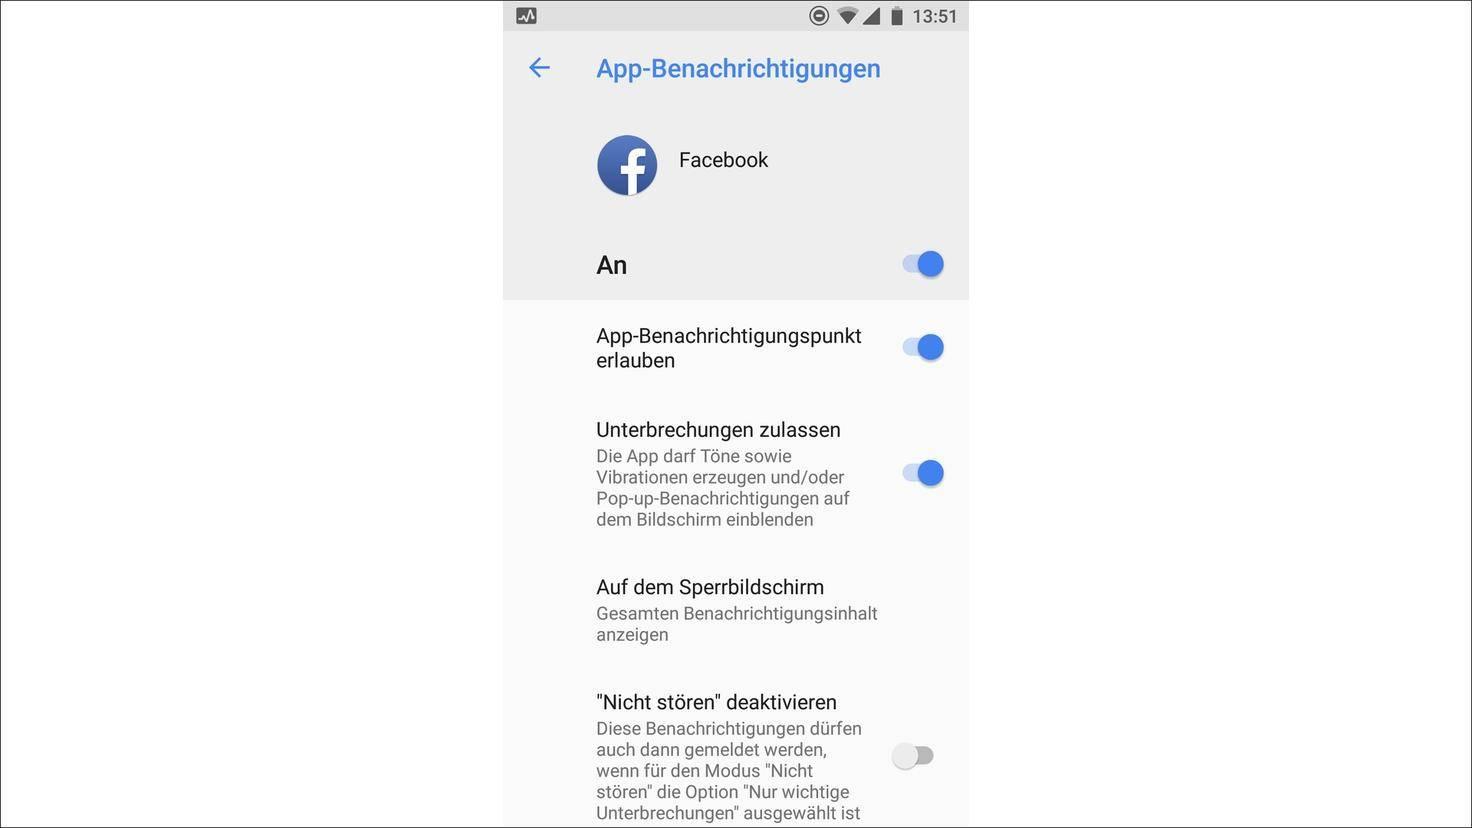 Facebook-App-Benachrichtigungen